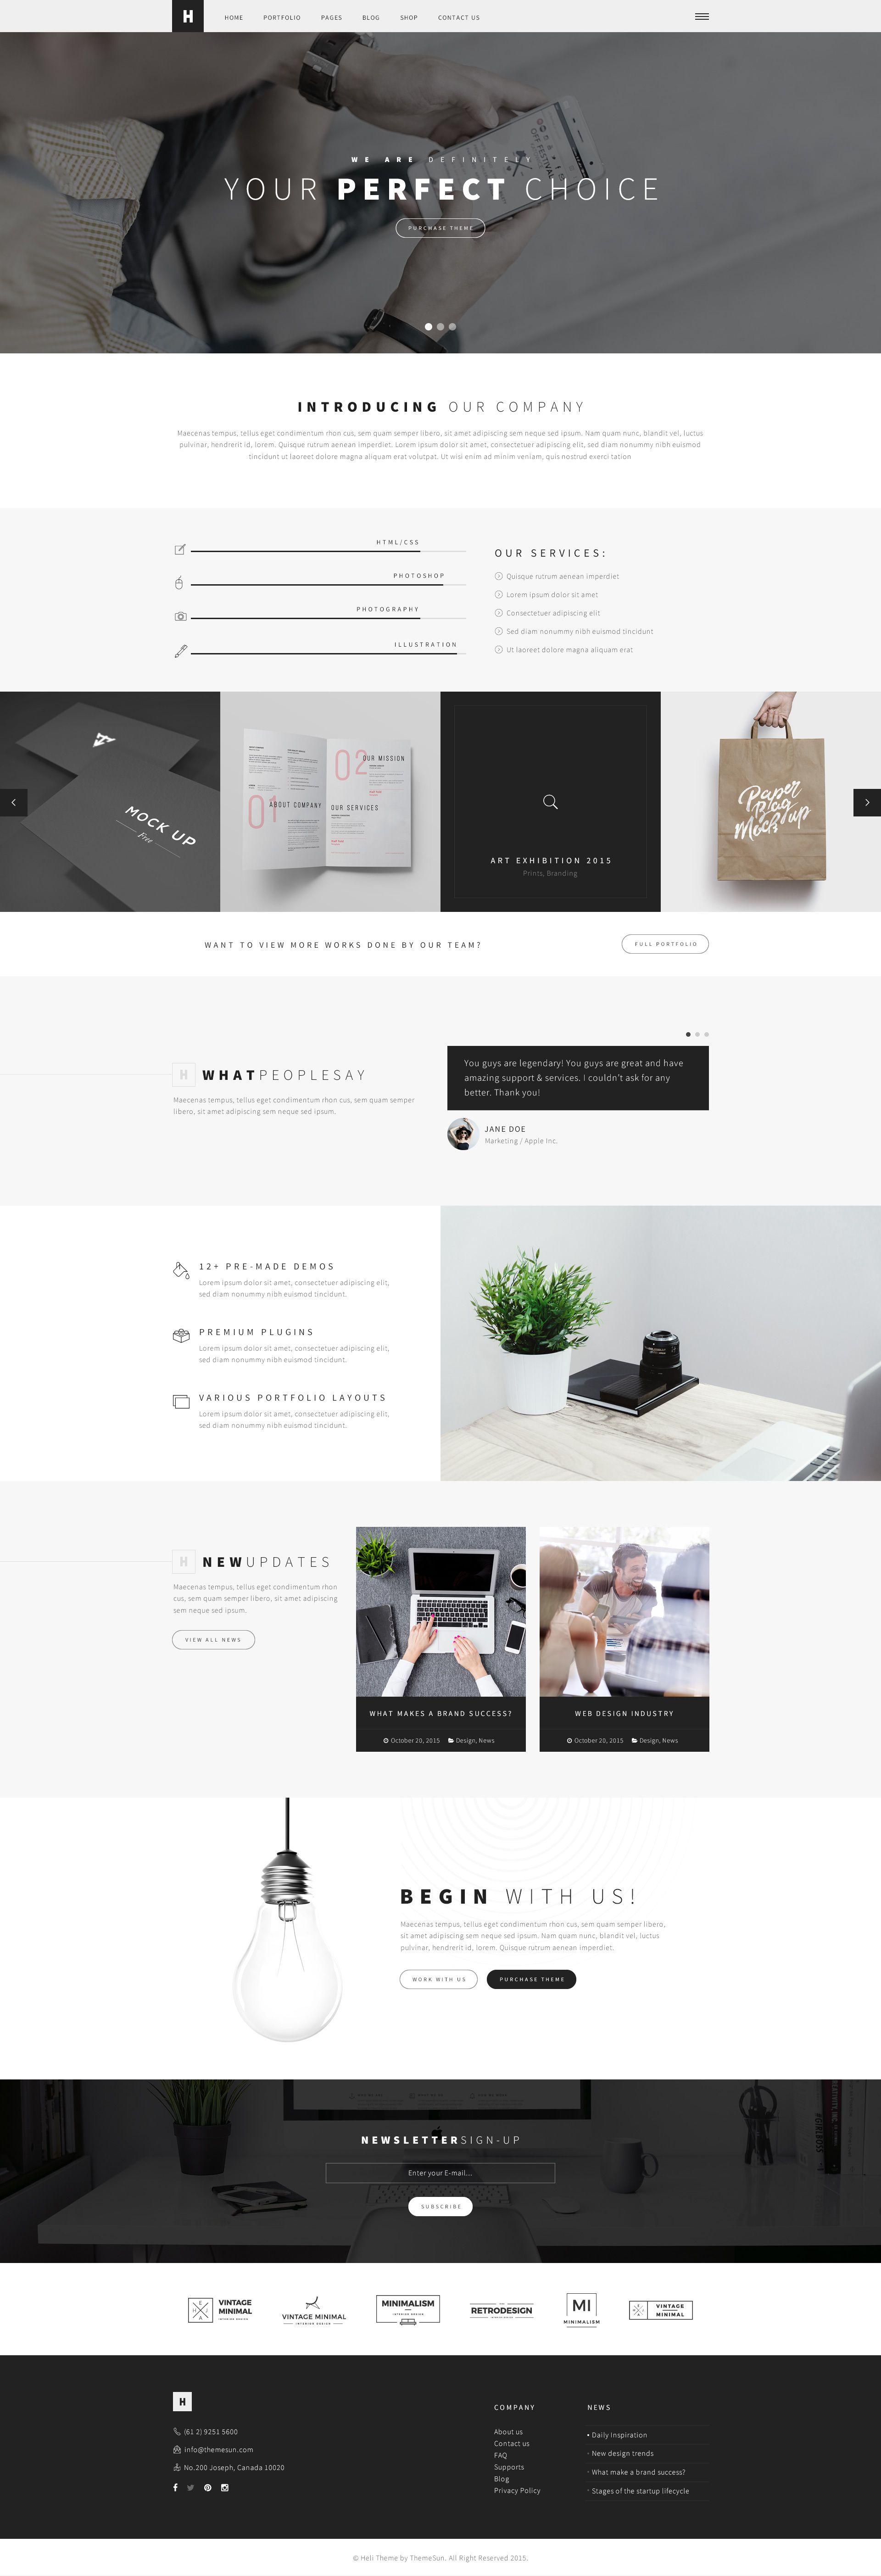 Heli A Creative Multipurpose Psd Template Clean Web Design Inspiration Webpage Design Clean Web Design